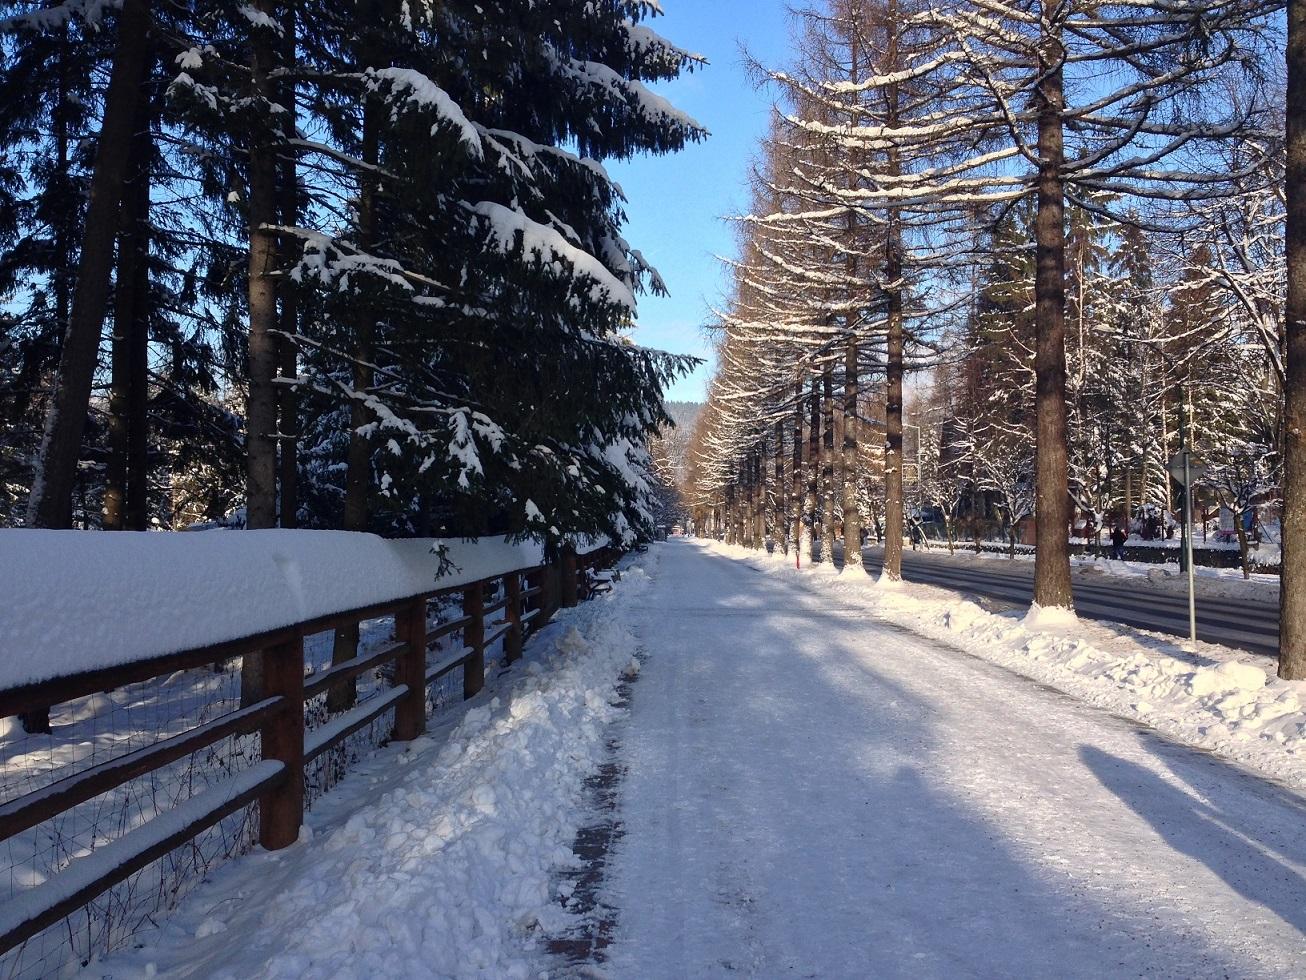 Zakopane télen